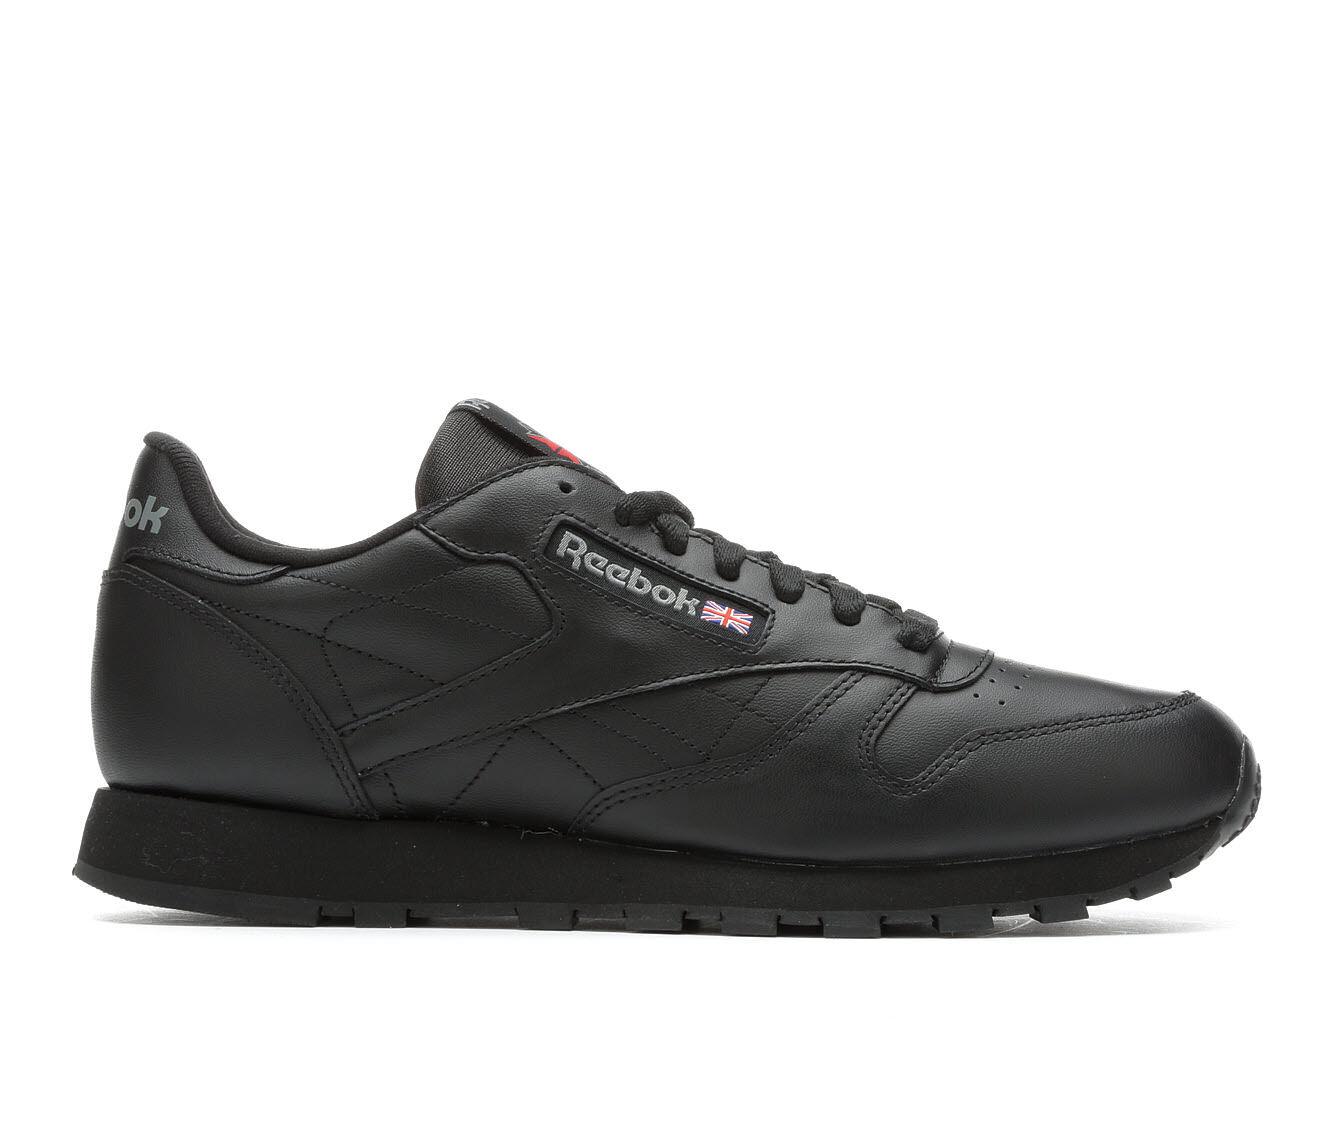 Men's Reebok Classic Leather Retro Sneakers Black